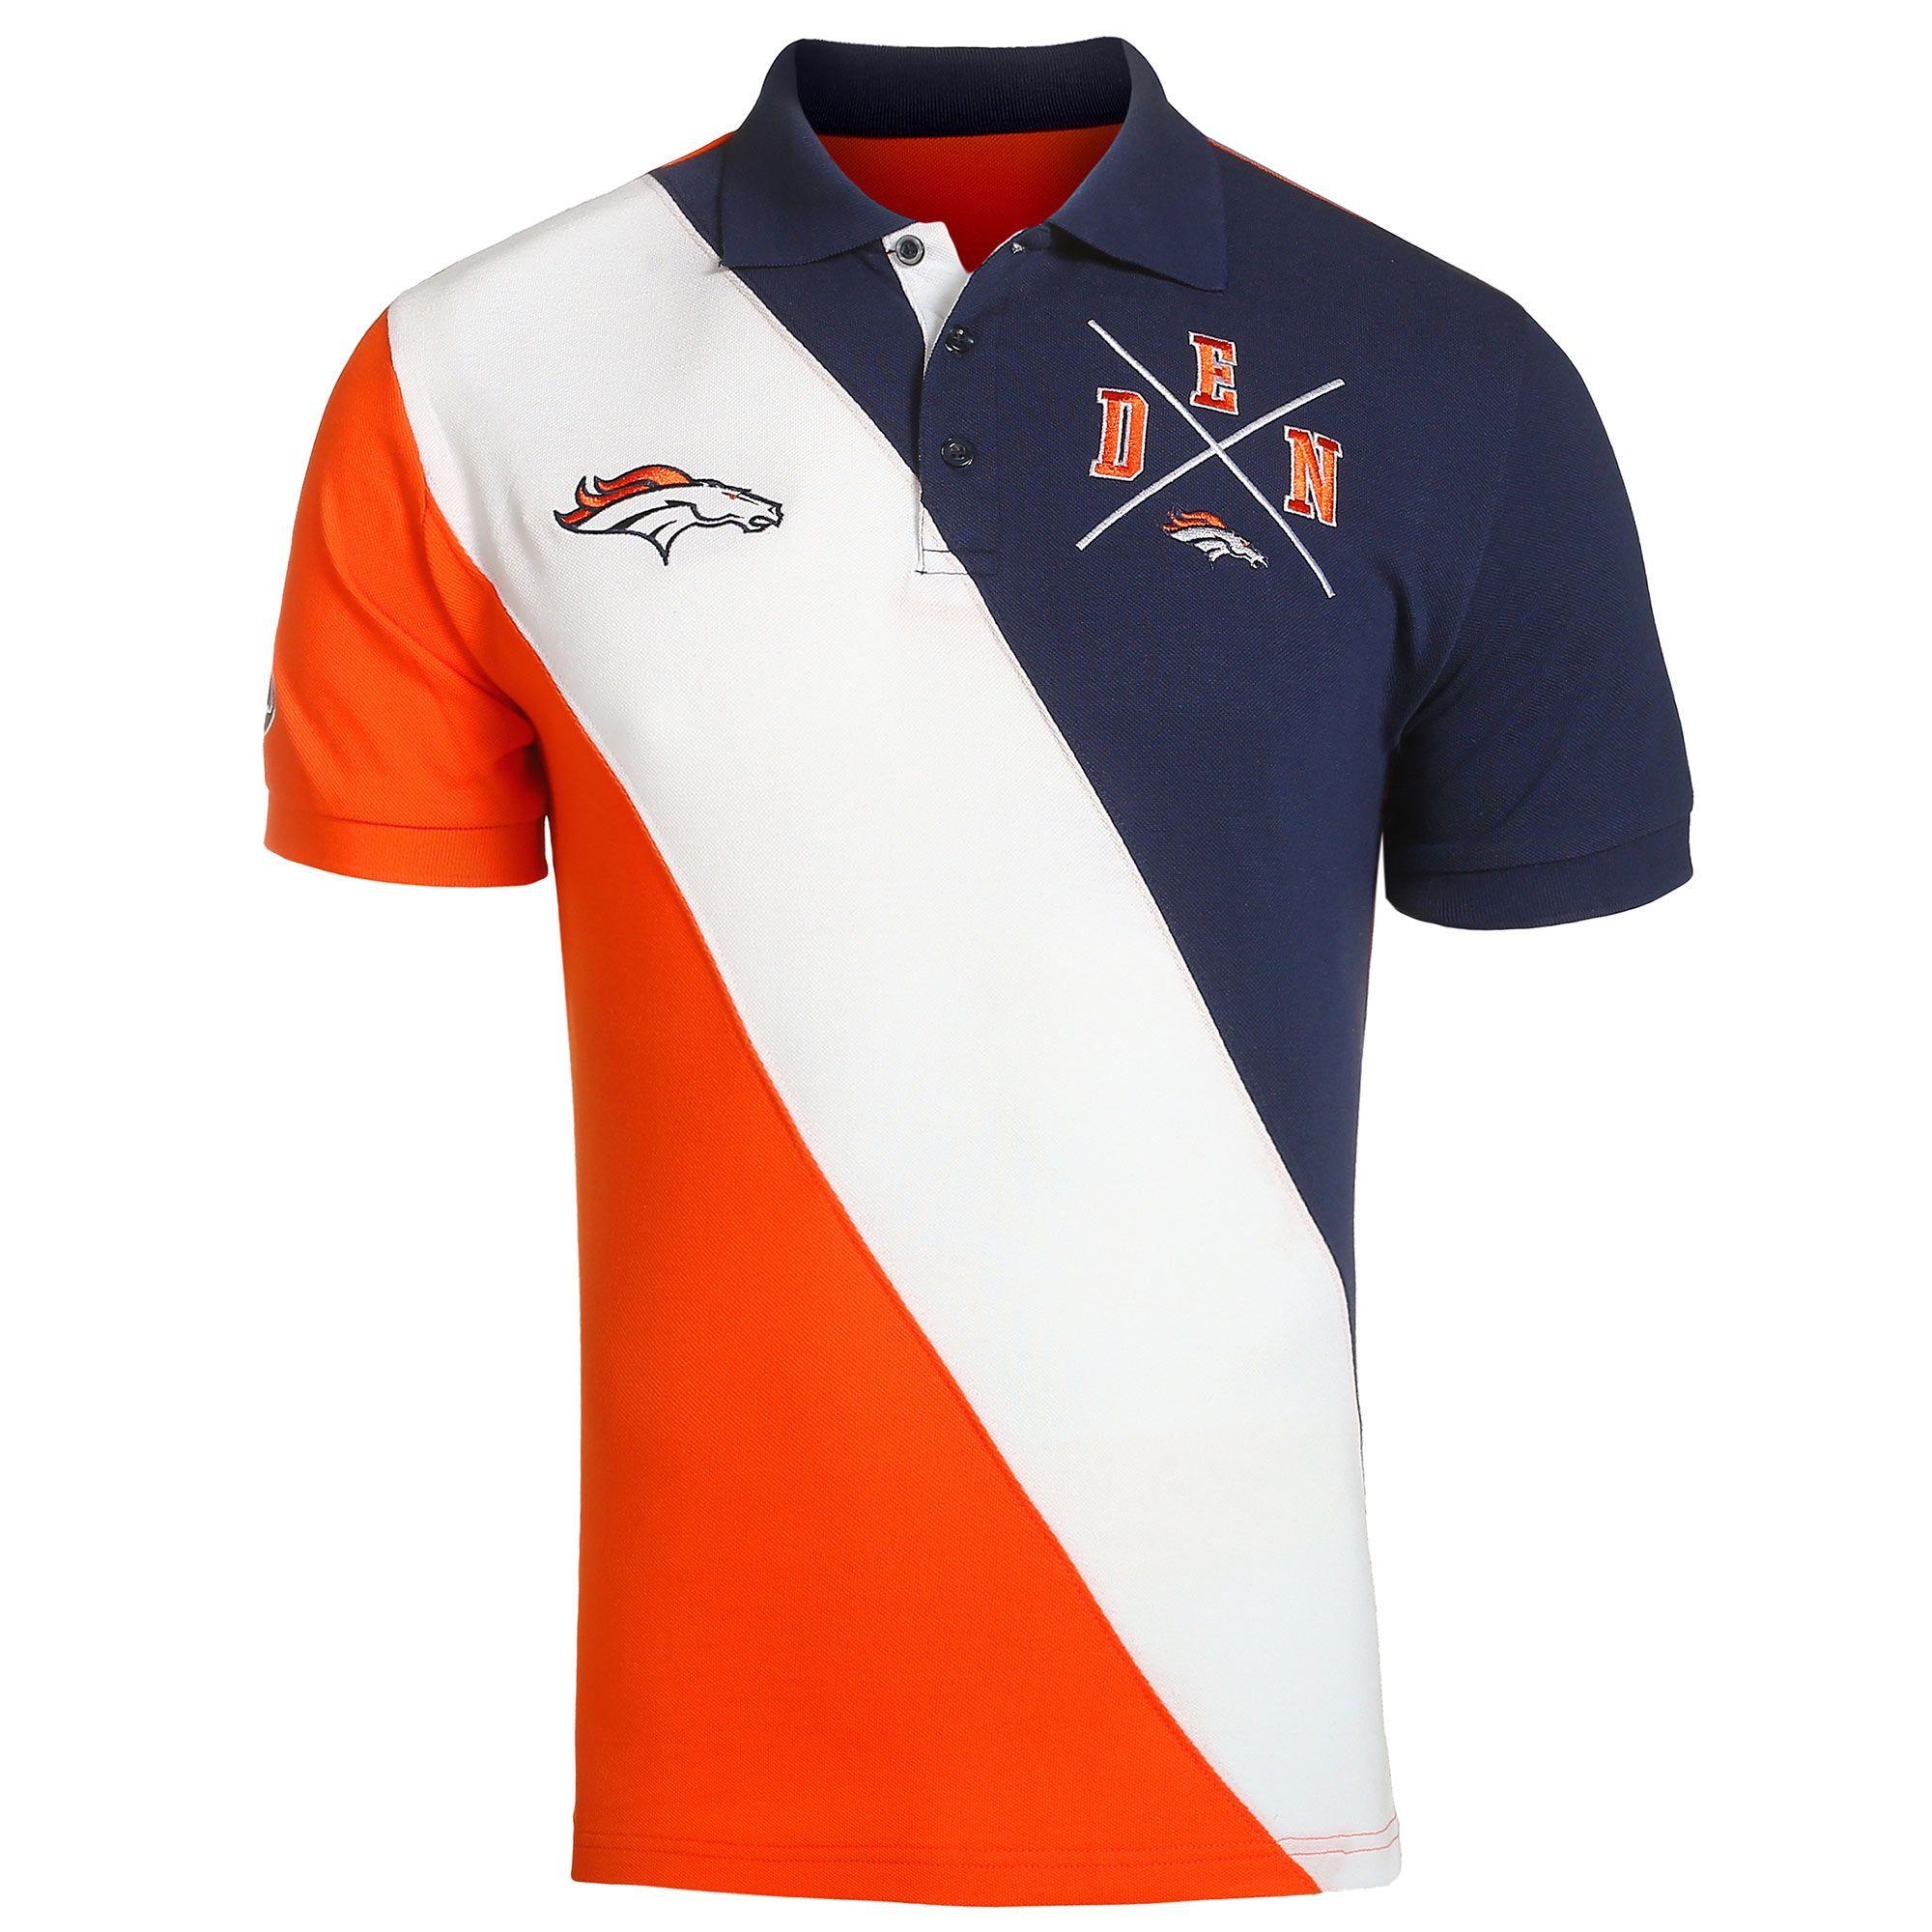 993884a5 NFL Denver Broncos Klew Diagonal Stripe Rugby Polo - Navy/Orange ...